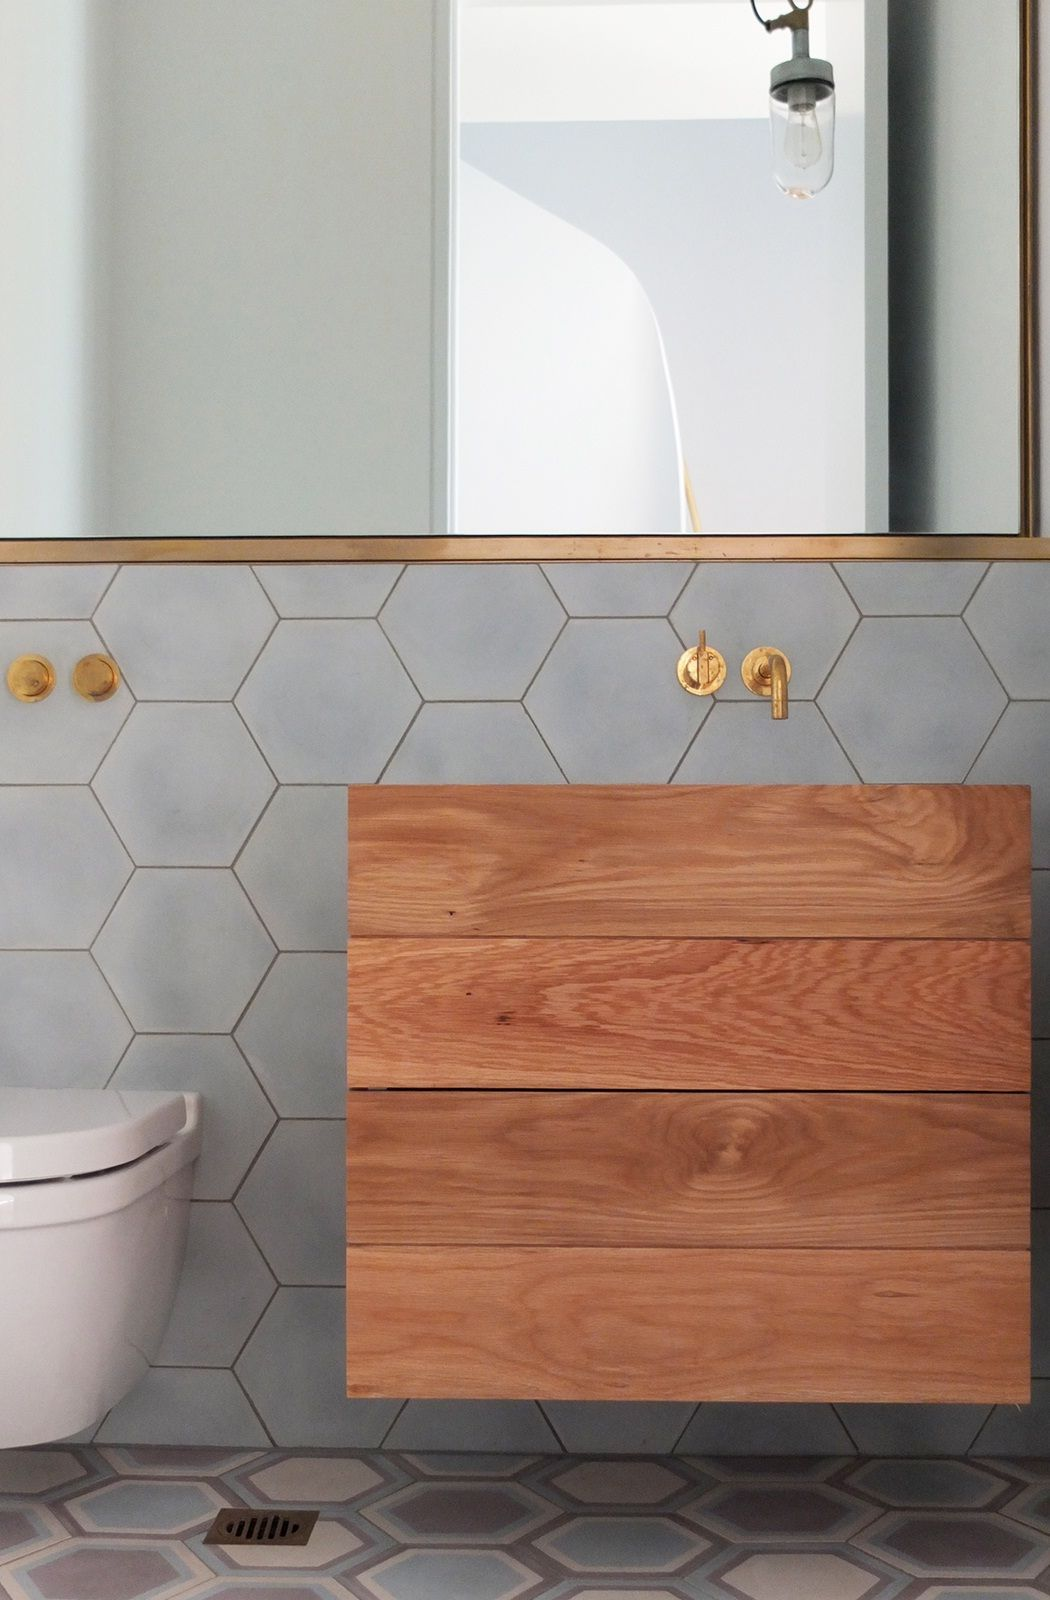 Carrelage Gris Meuble Bois salle de bain carrelage hexagonal gris, meuble vasque bois